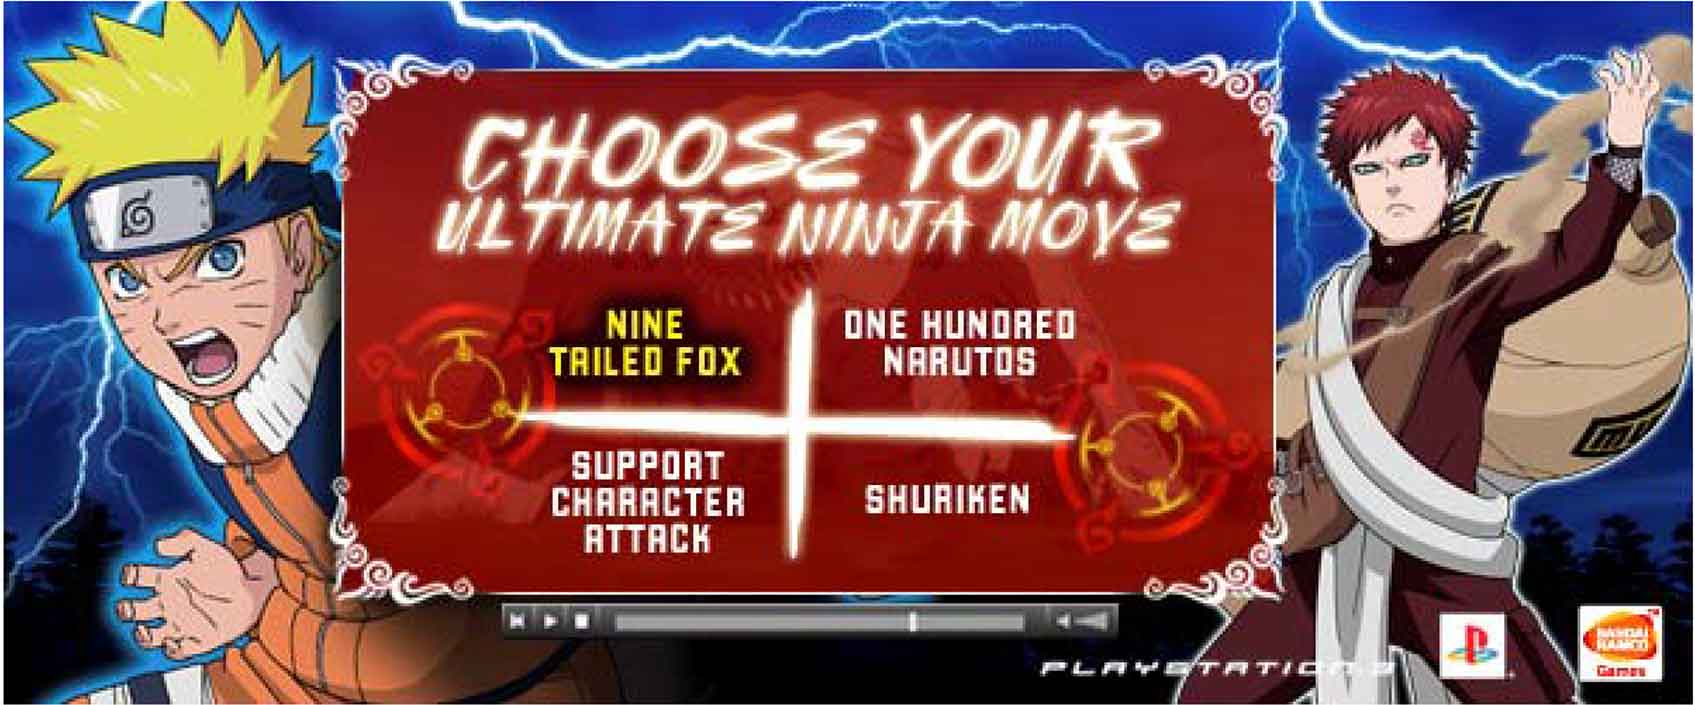 Microsoft PowerPoint - Naruto_UltimateNinja_Online_R1.ppt